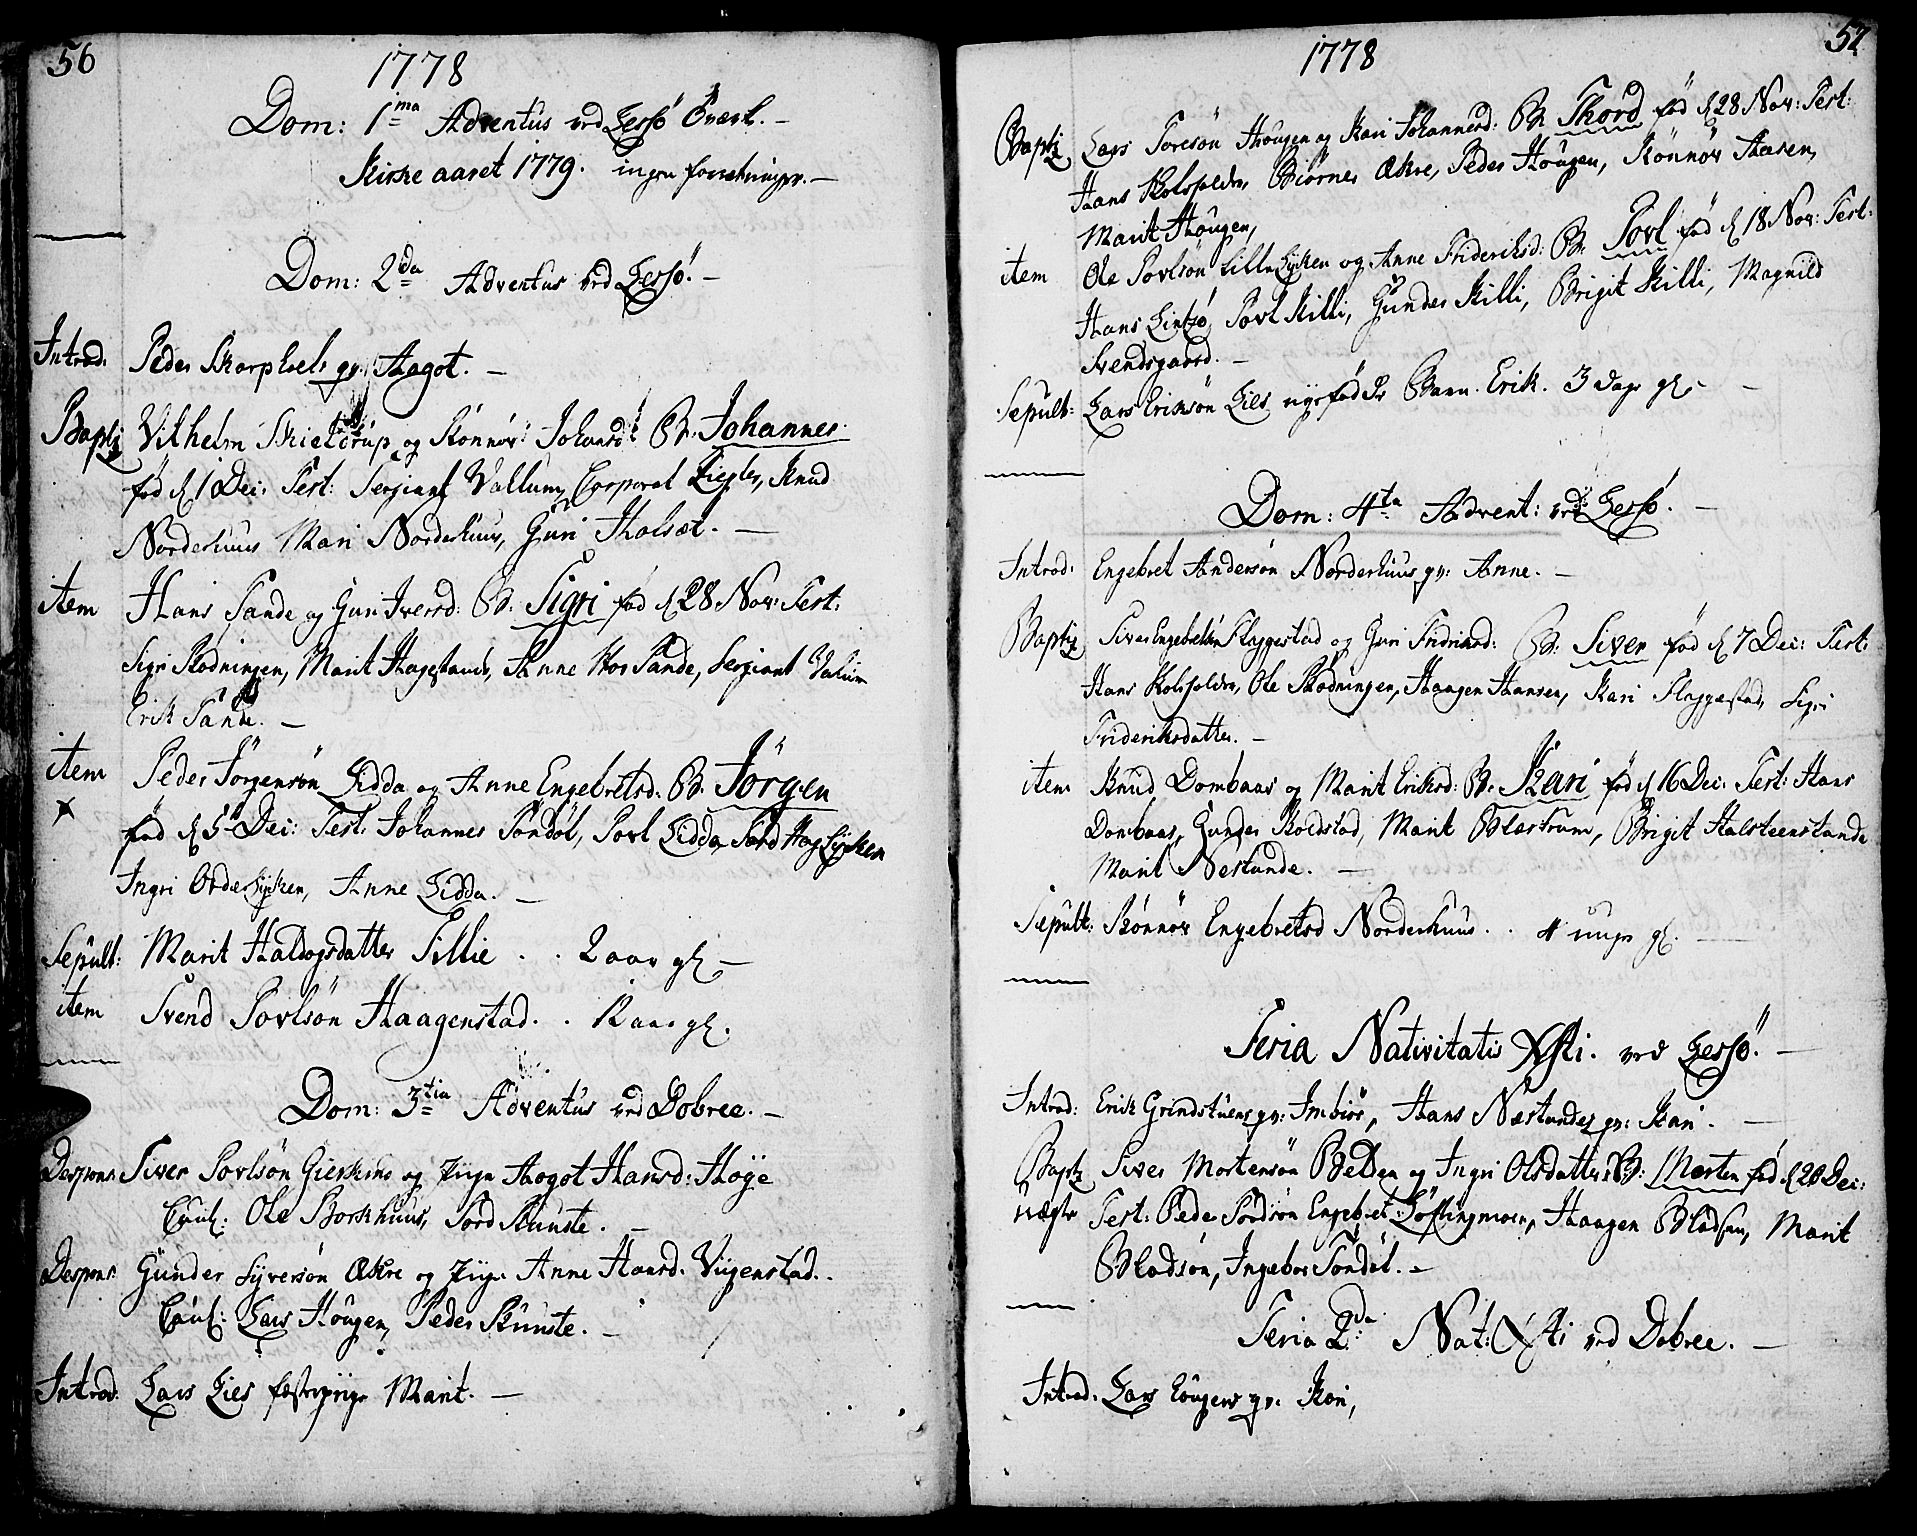 SAH, Lesja prestekontor, Ministerialbok nr. 3, 1777-1819, s. 56-57